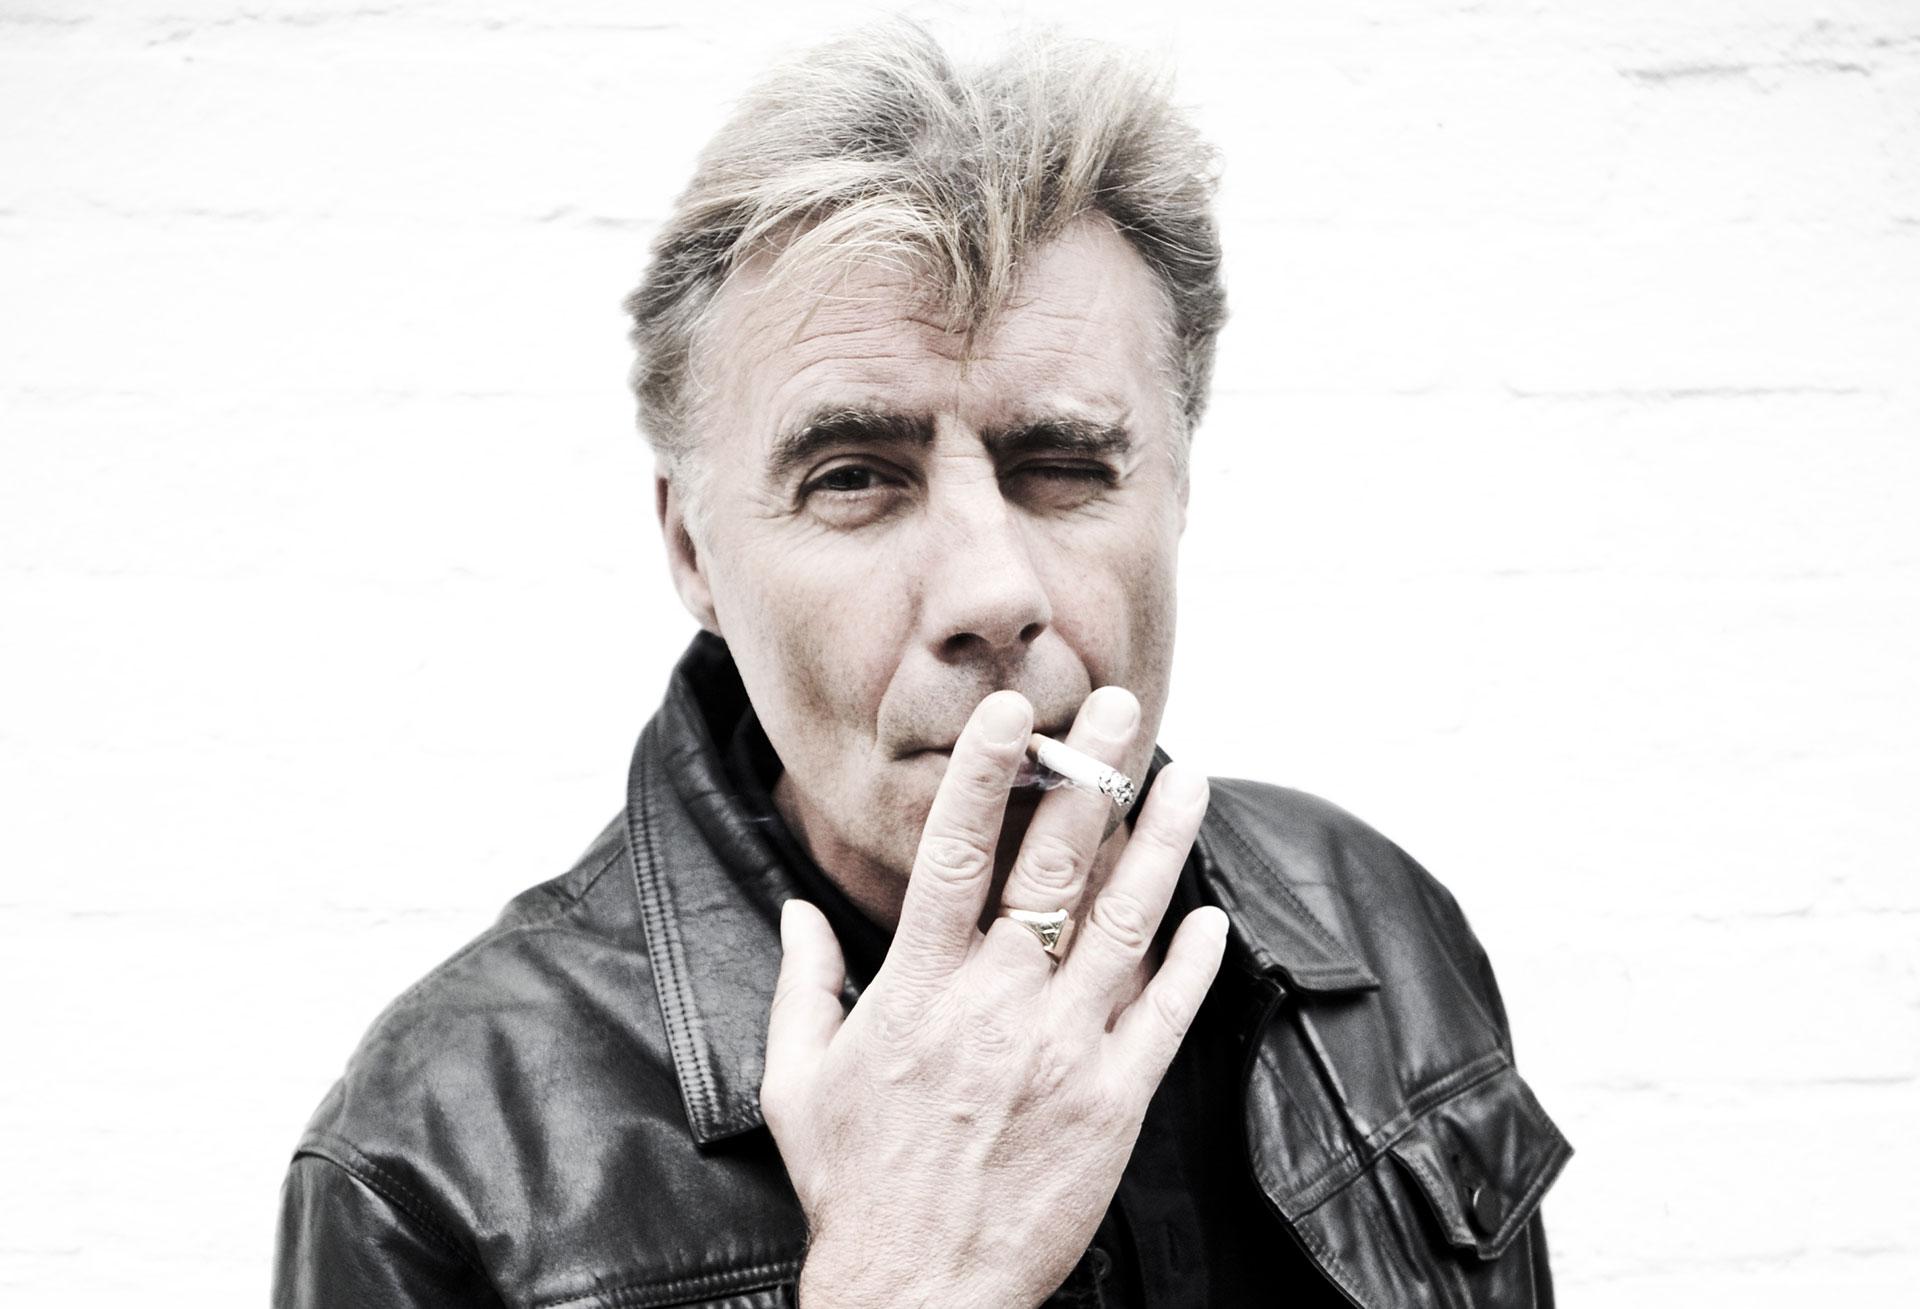 Glen Matlock (Sex Pistols) se presenta en Mar del Plata